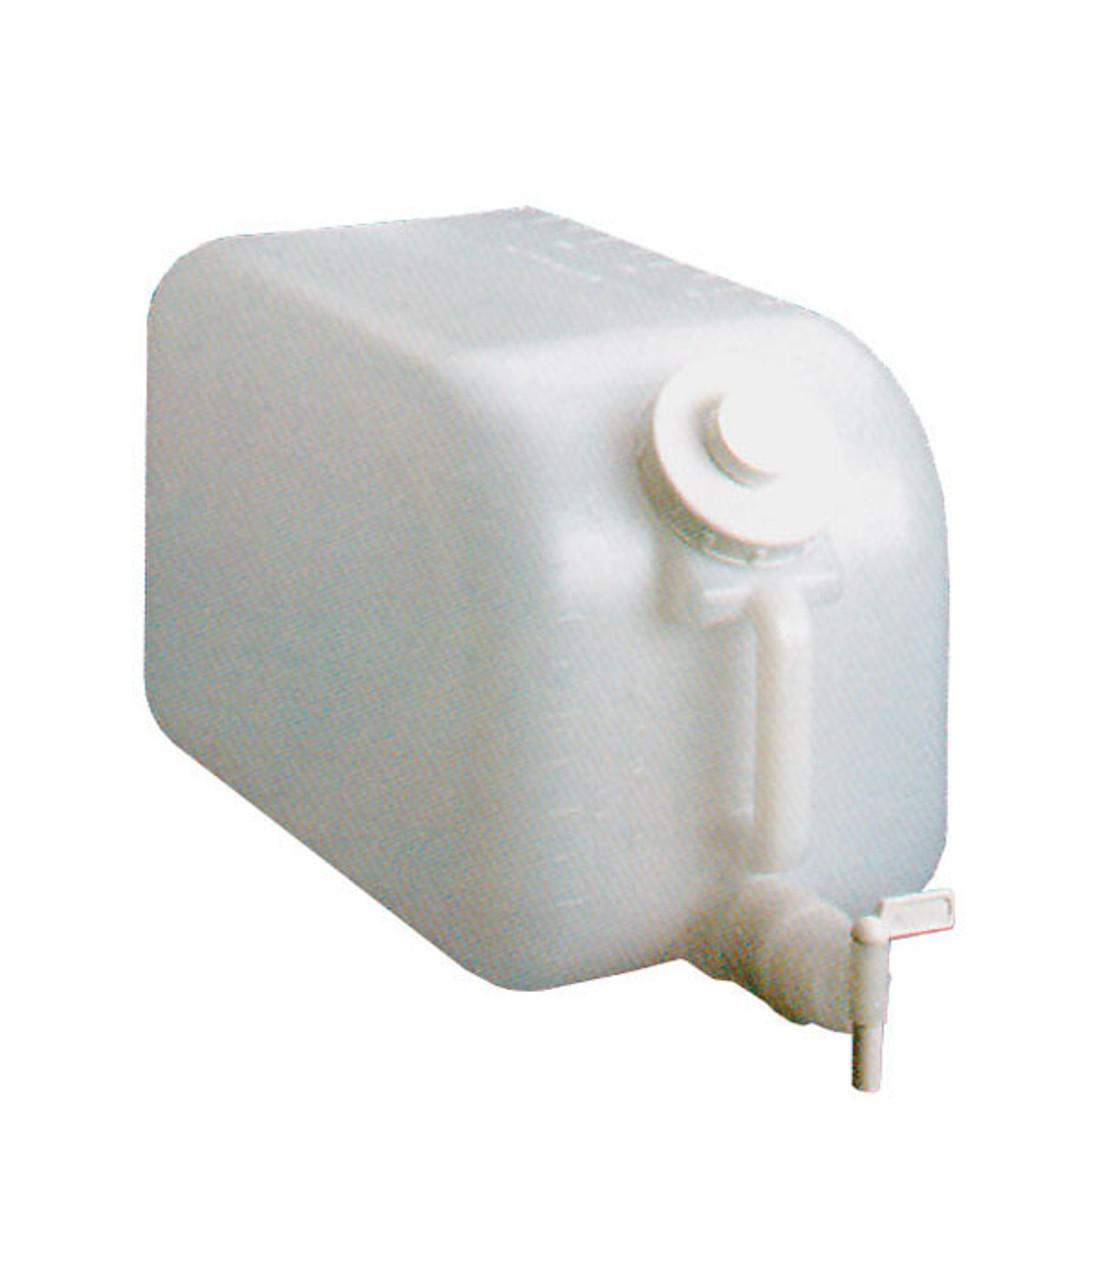 Shur-Fill 5 Gallon Storage Tank